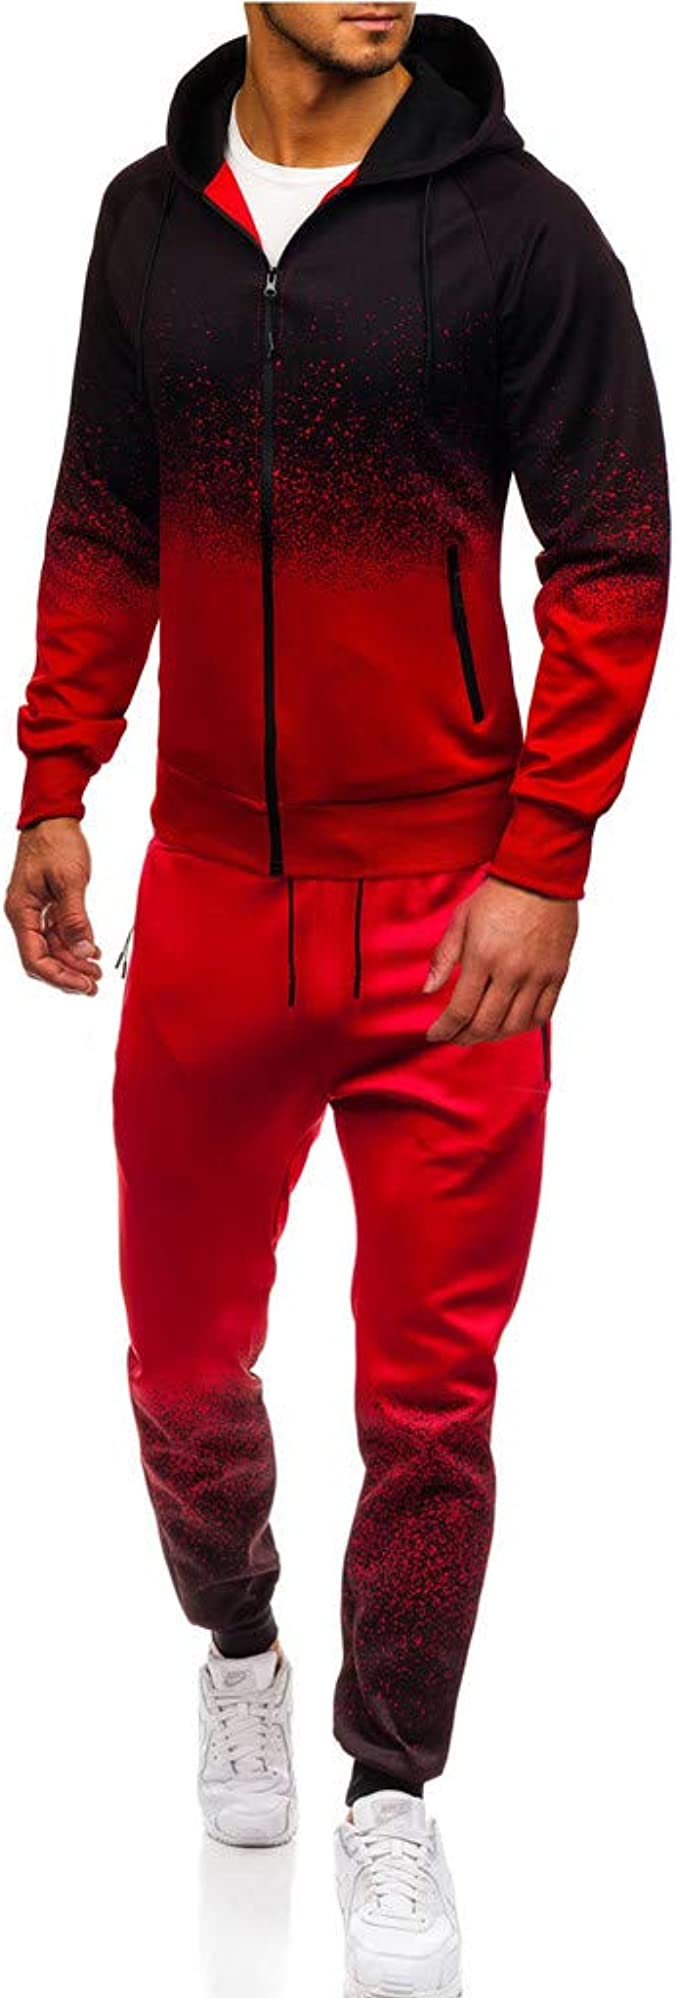 Letter Printed Jogging Sets for Men,Hooded Sweatshirt+Jogger Sweatpants Gym Muscle Sports Suit Leisure Tracksuit by Leegor